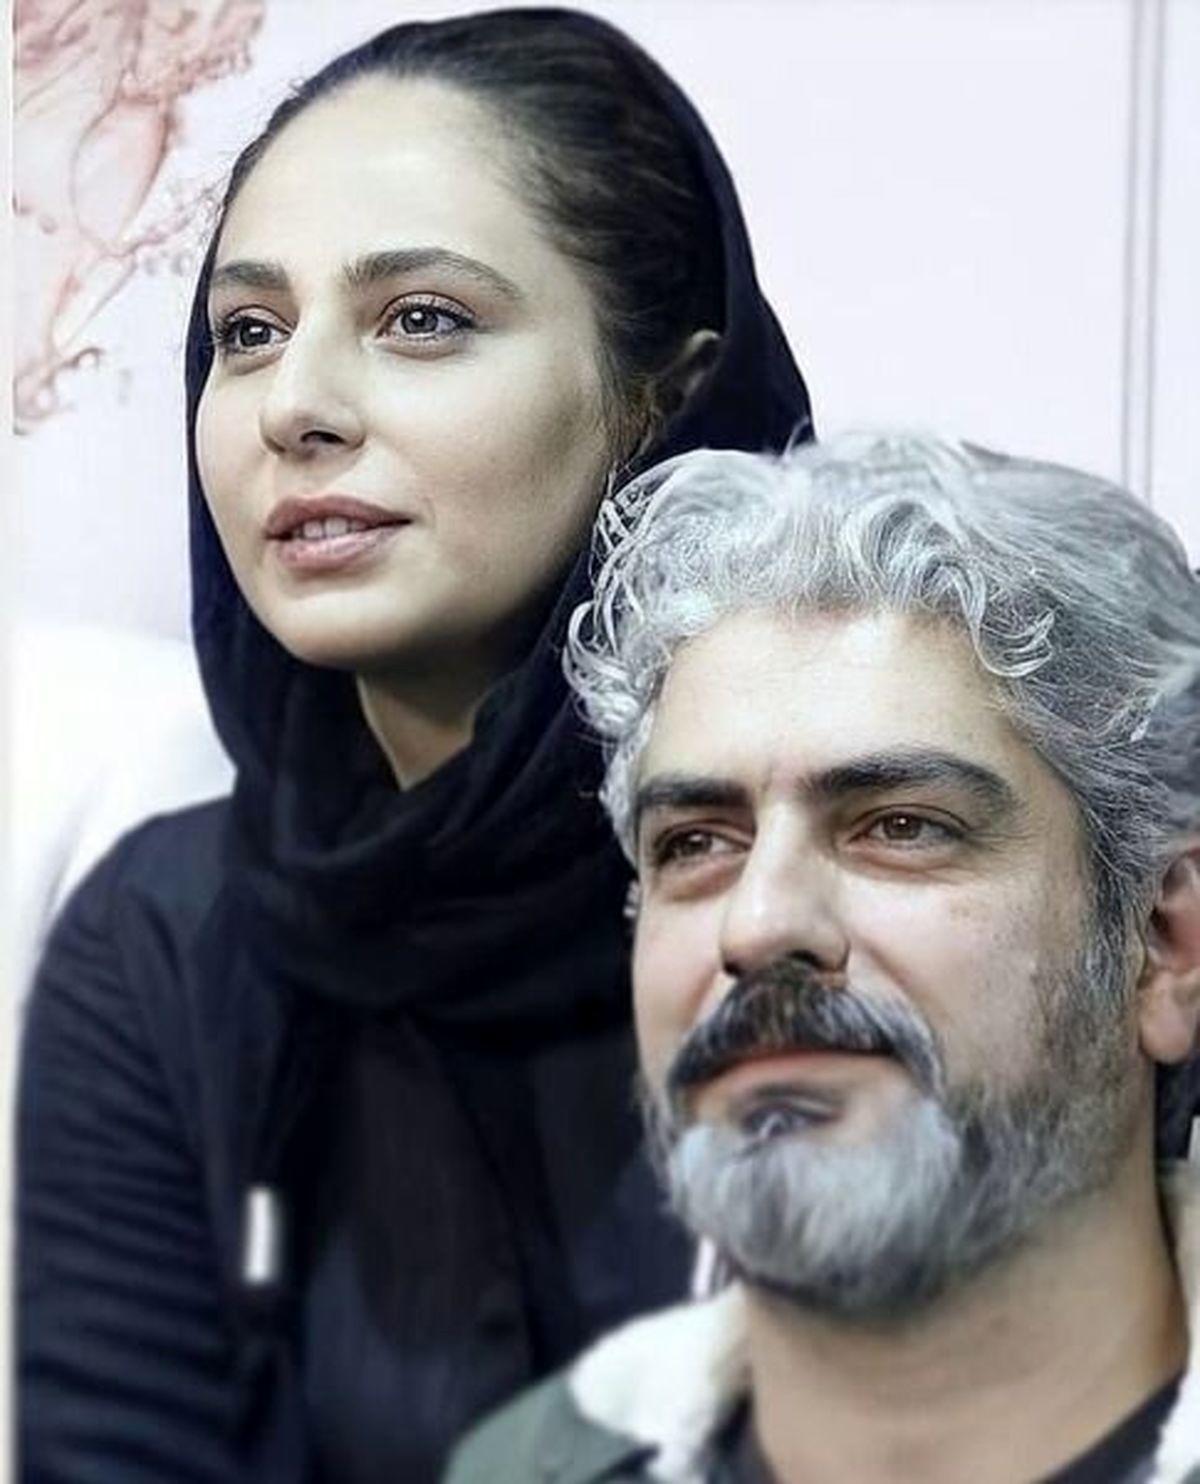 عکس عاشقانه مهدی پاکدل و همسرش لو رفت+تصاویر دیده نشده